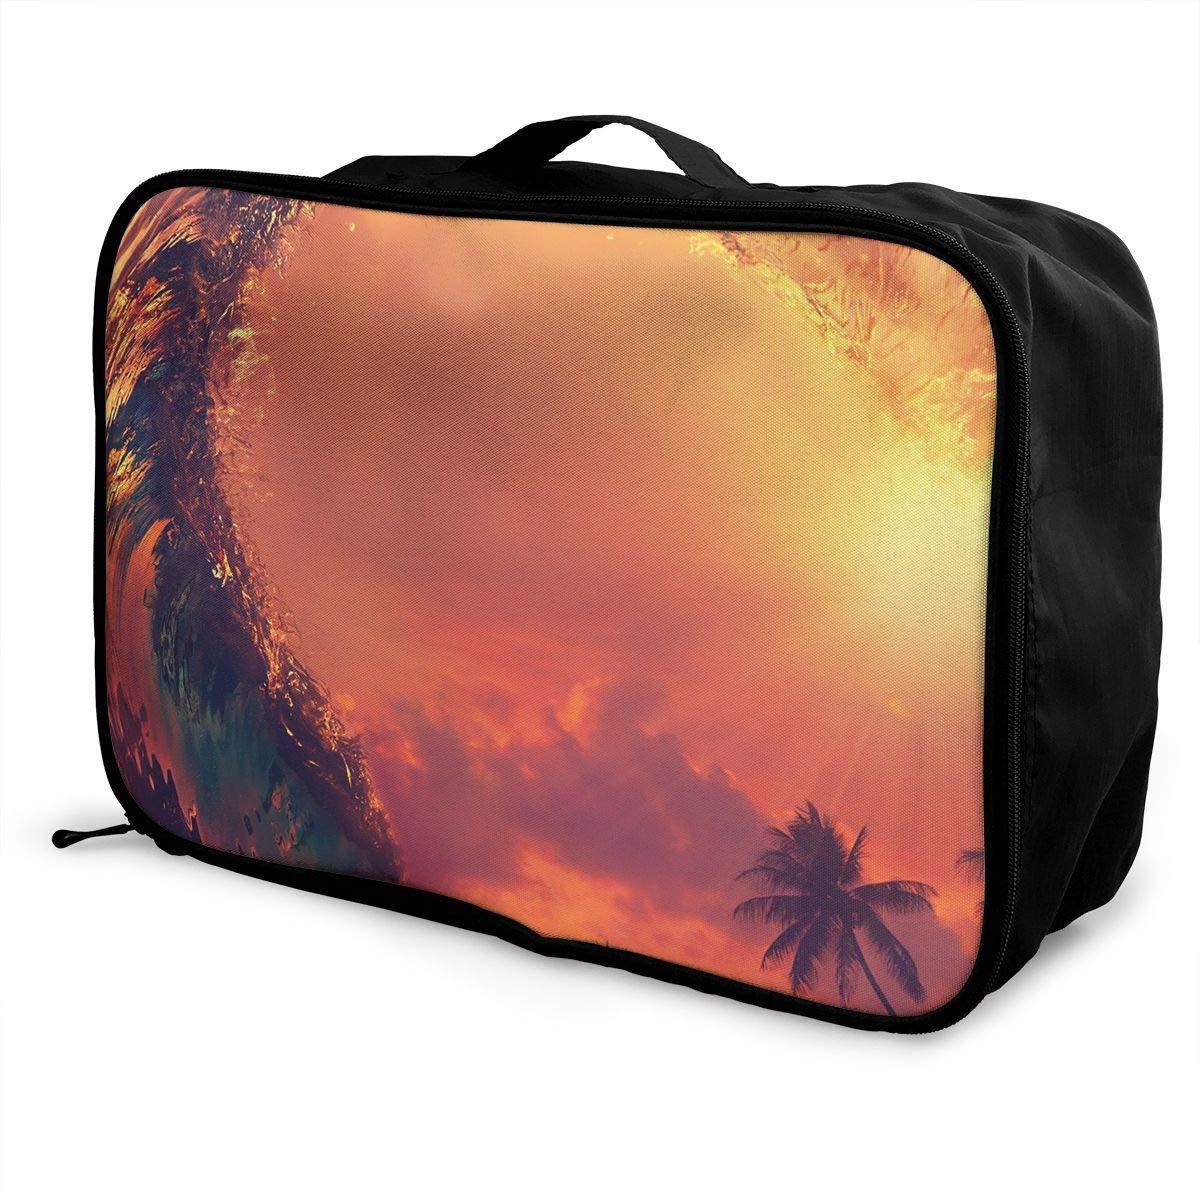 Lightweight Large Capacity Portable Luggage Bag Dusk Surfing Travel Duffel Bag Backpack